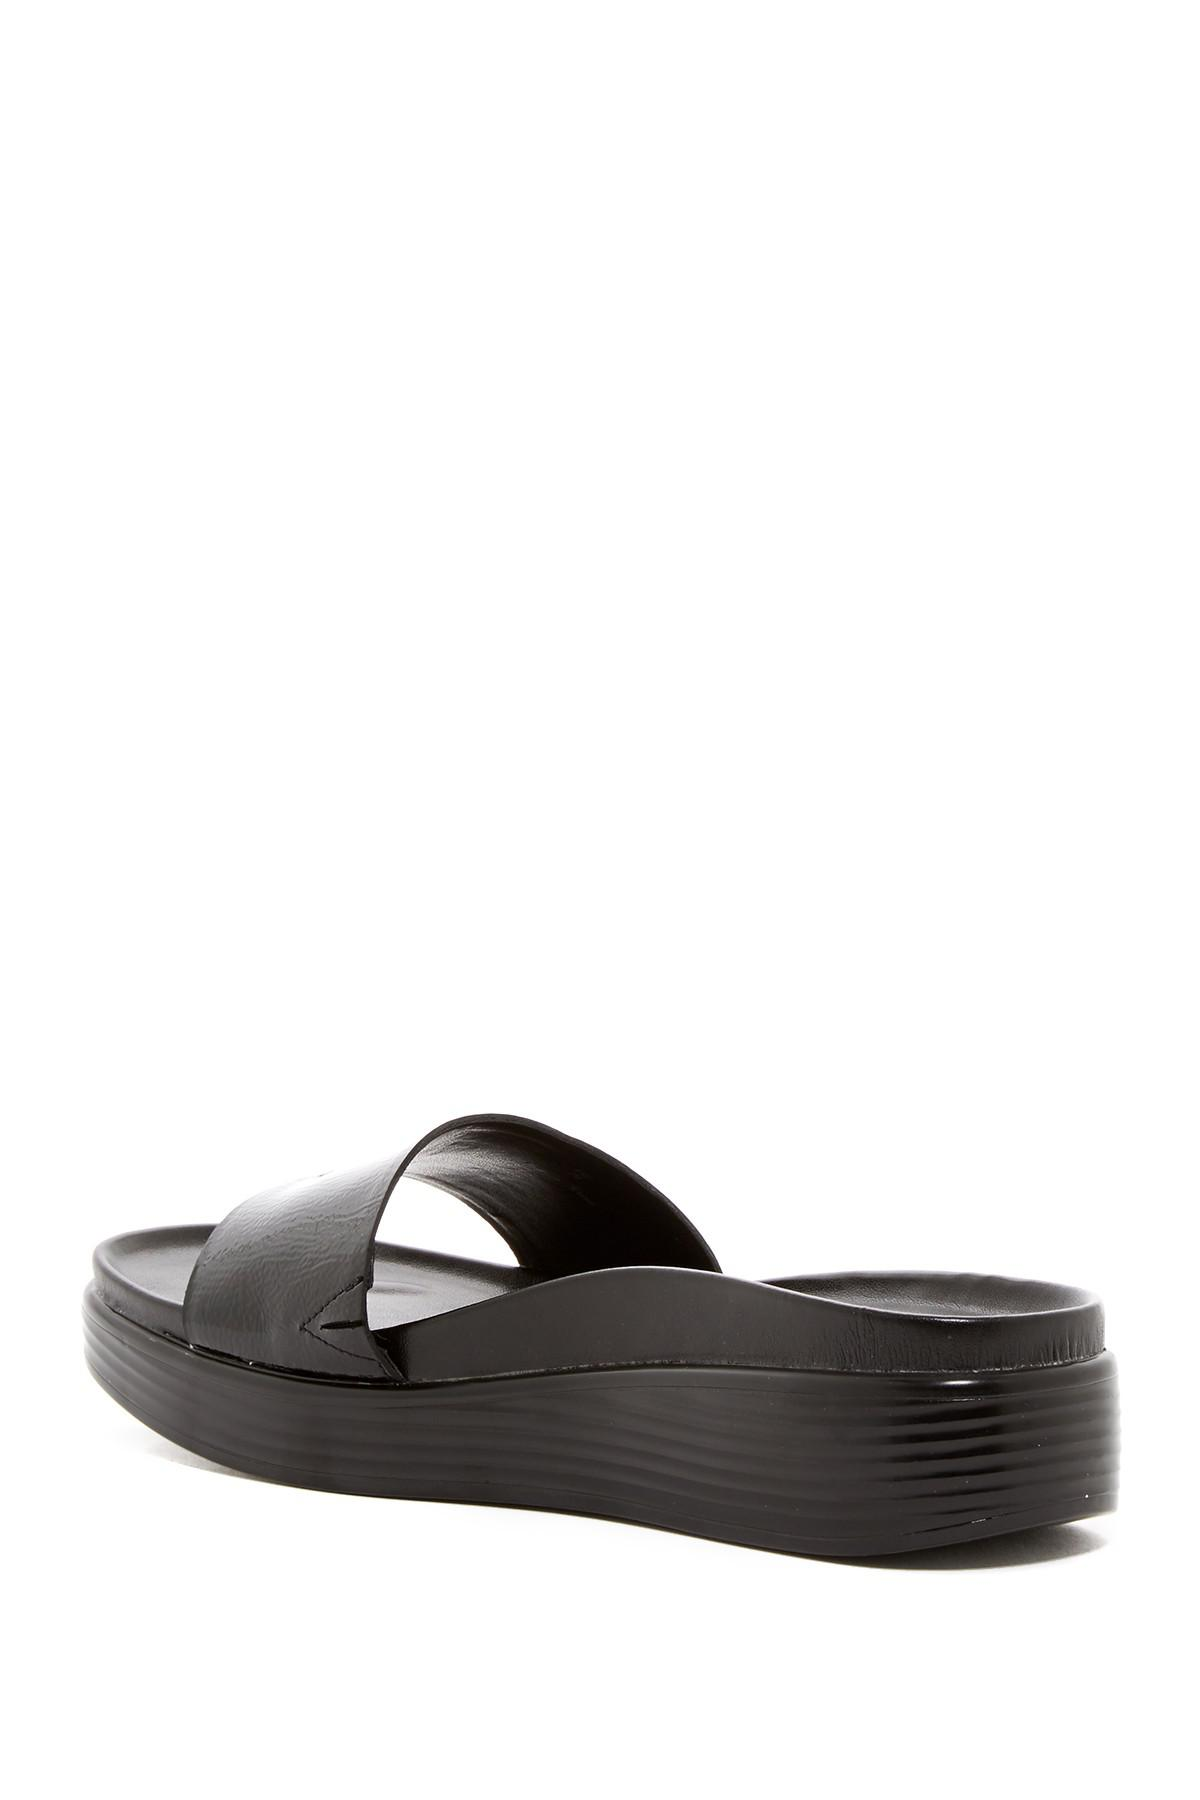 f6a922132e8 Lyst - Donald J Pliner Fiji Platform Hidden Thong Sandal in Black